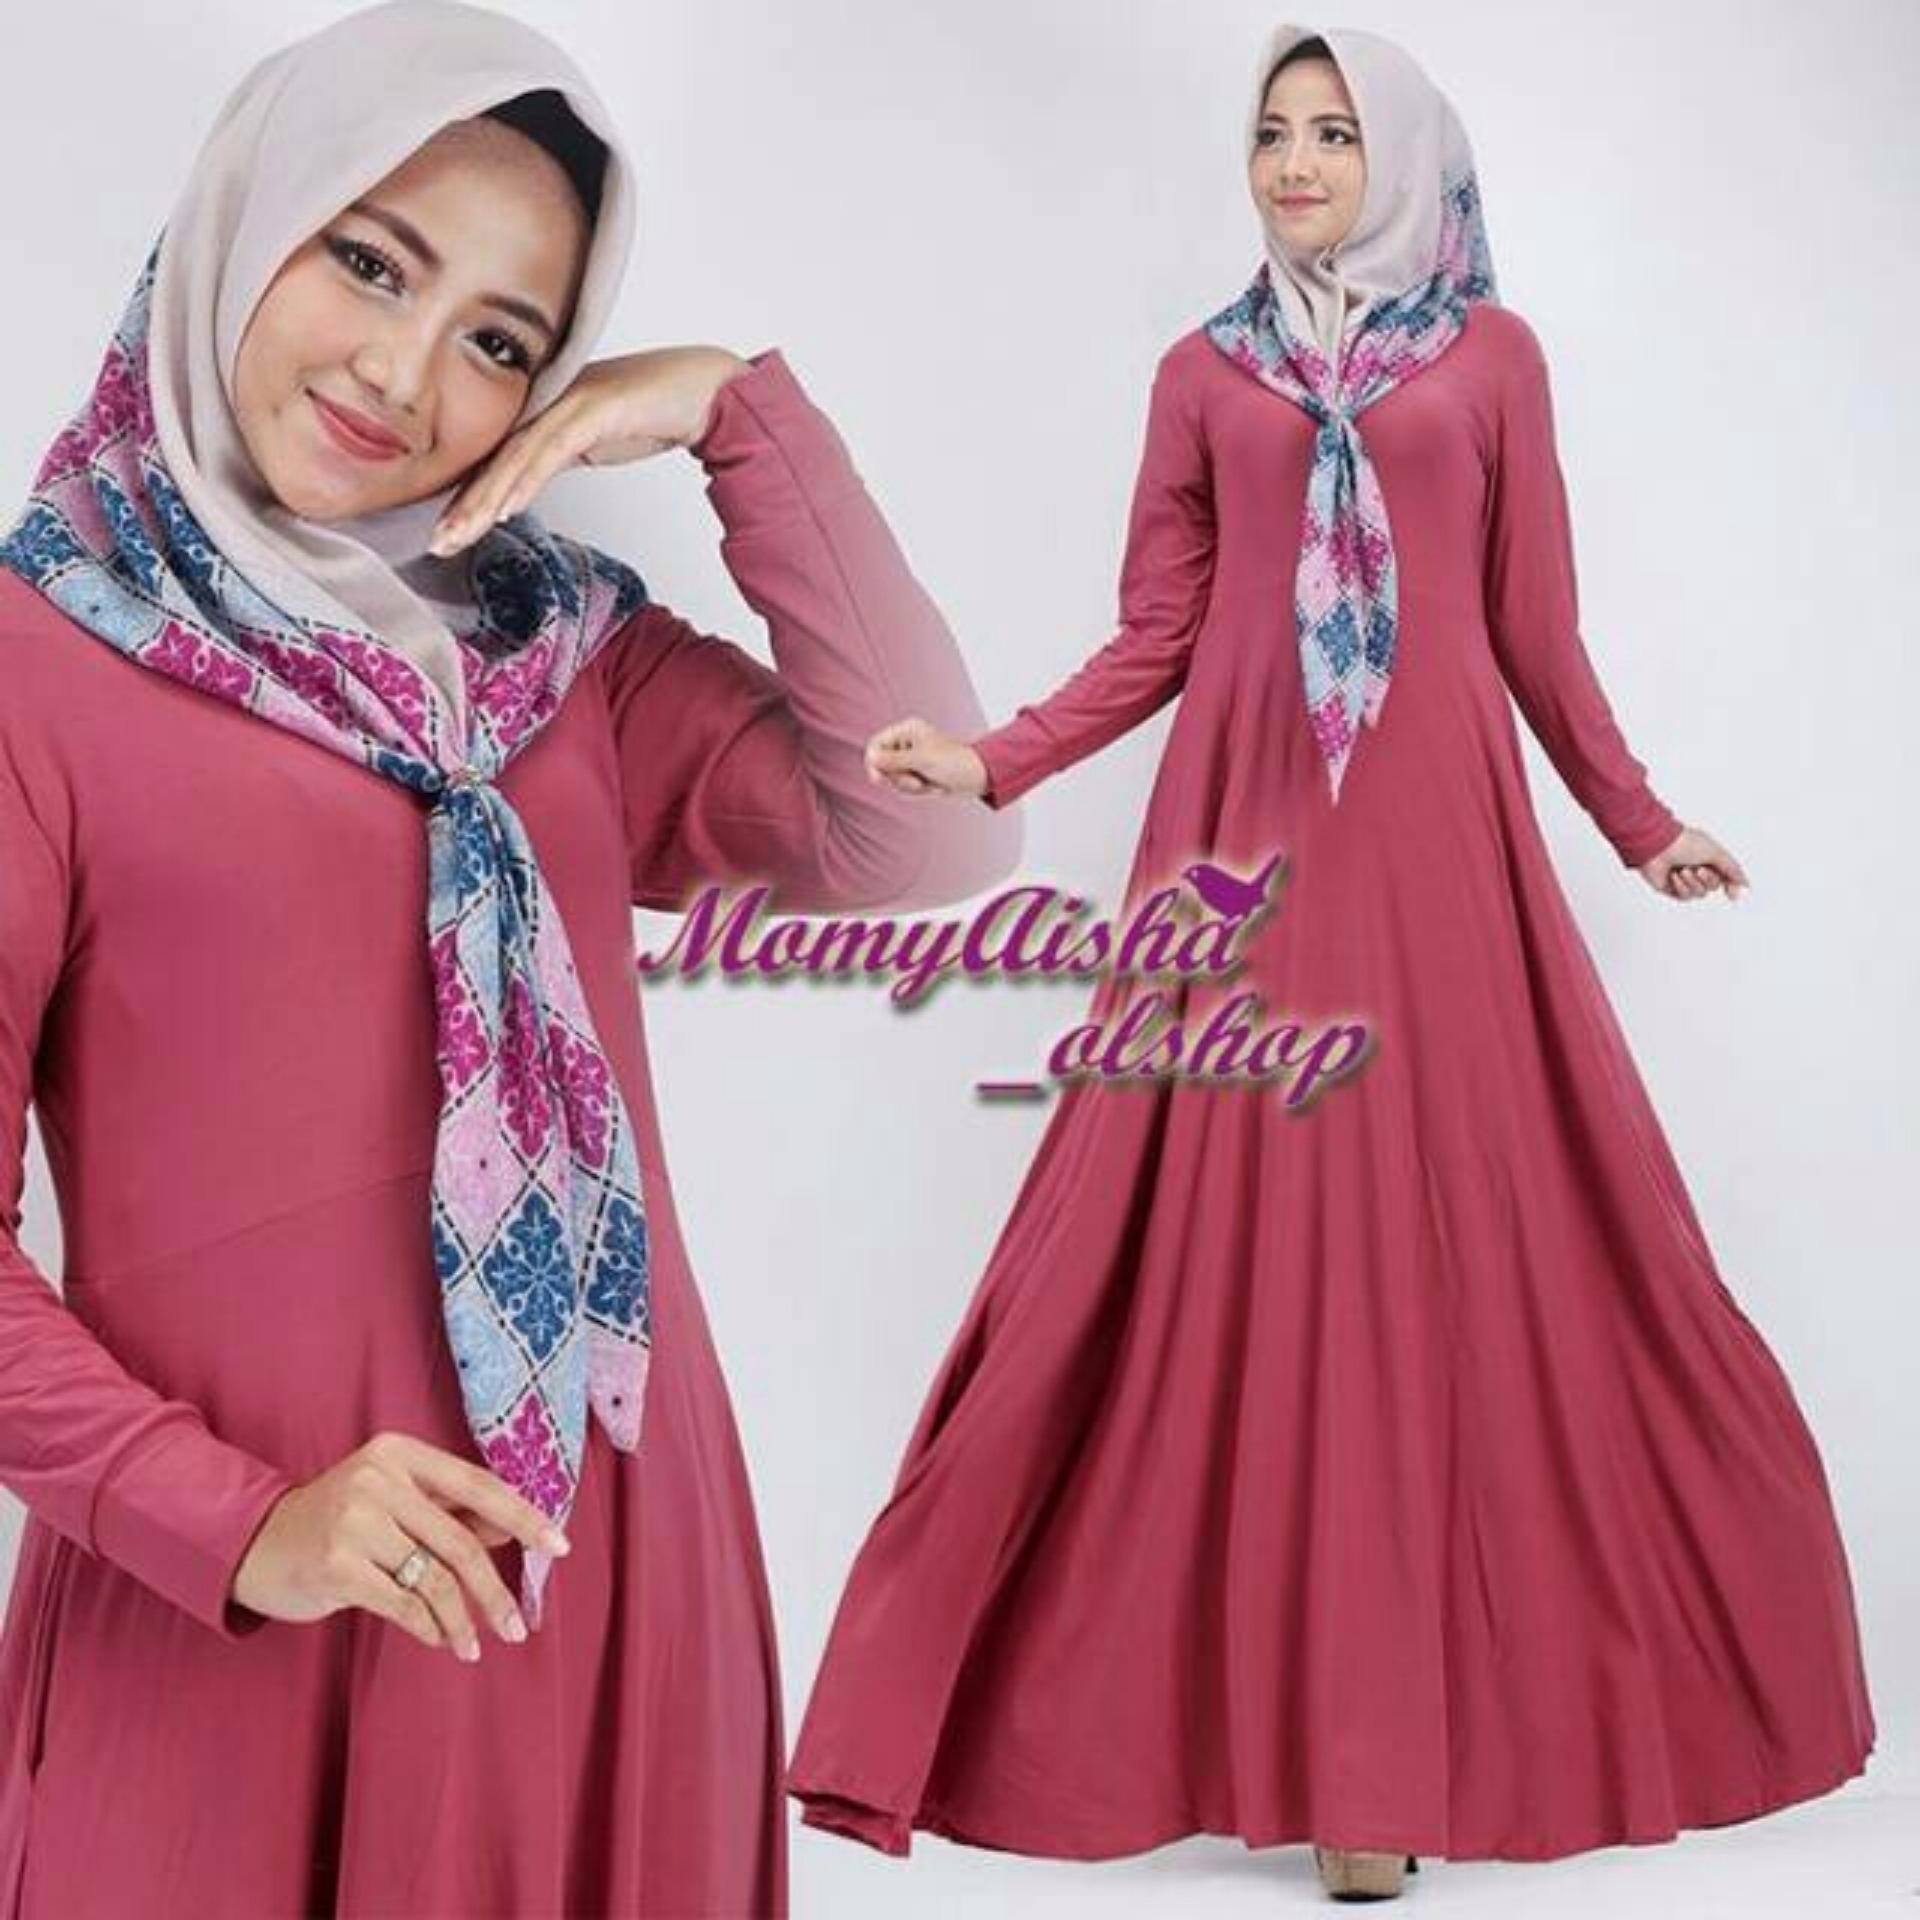 Tanah Abang F- Baju SETELAN atasan dan bawahan / Setelan Blouse/ Kemeja wanita / Long Dress Maxy / Long Dress Wanita / Gaun Panjang/Gaun Wanita / Tunik Wanita / Dress Muslim / Atasan Muslim / Gamis ; Murah; Motif dan Warna Real Photo #Ukuran M, L dan XL